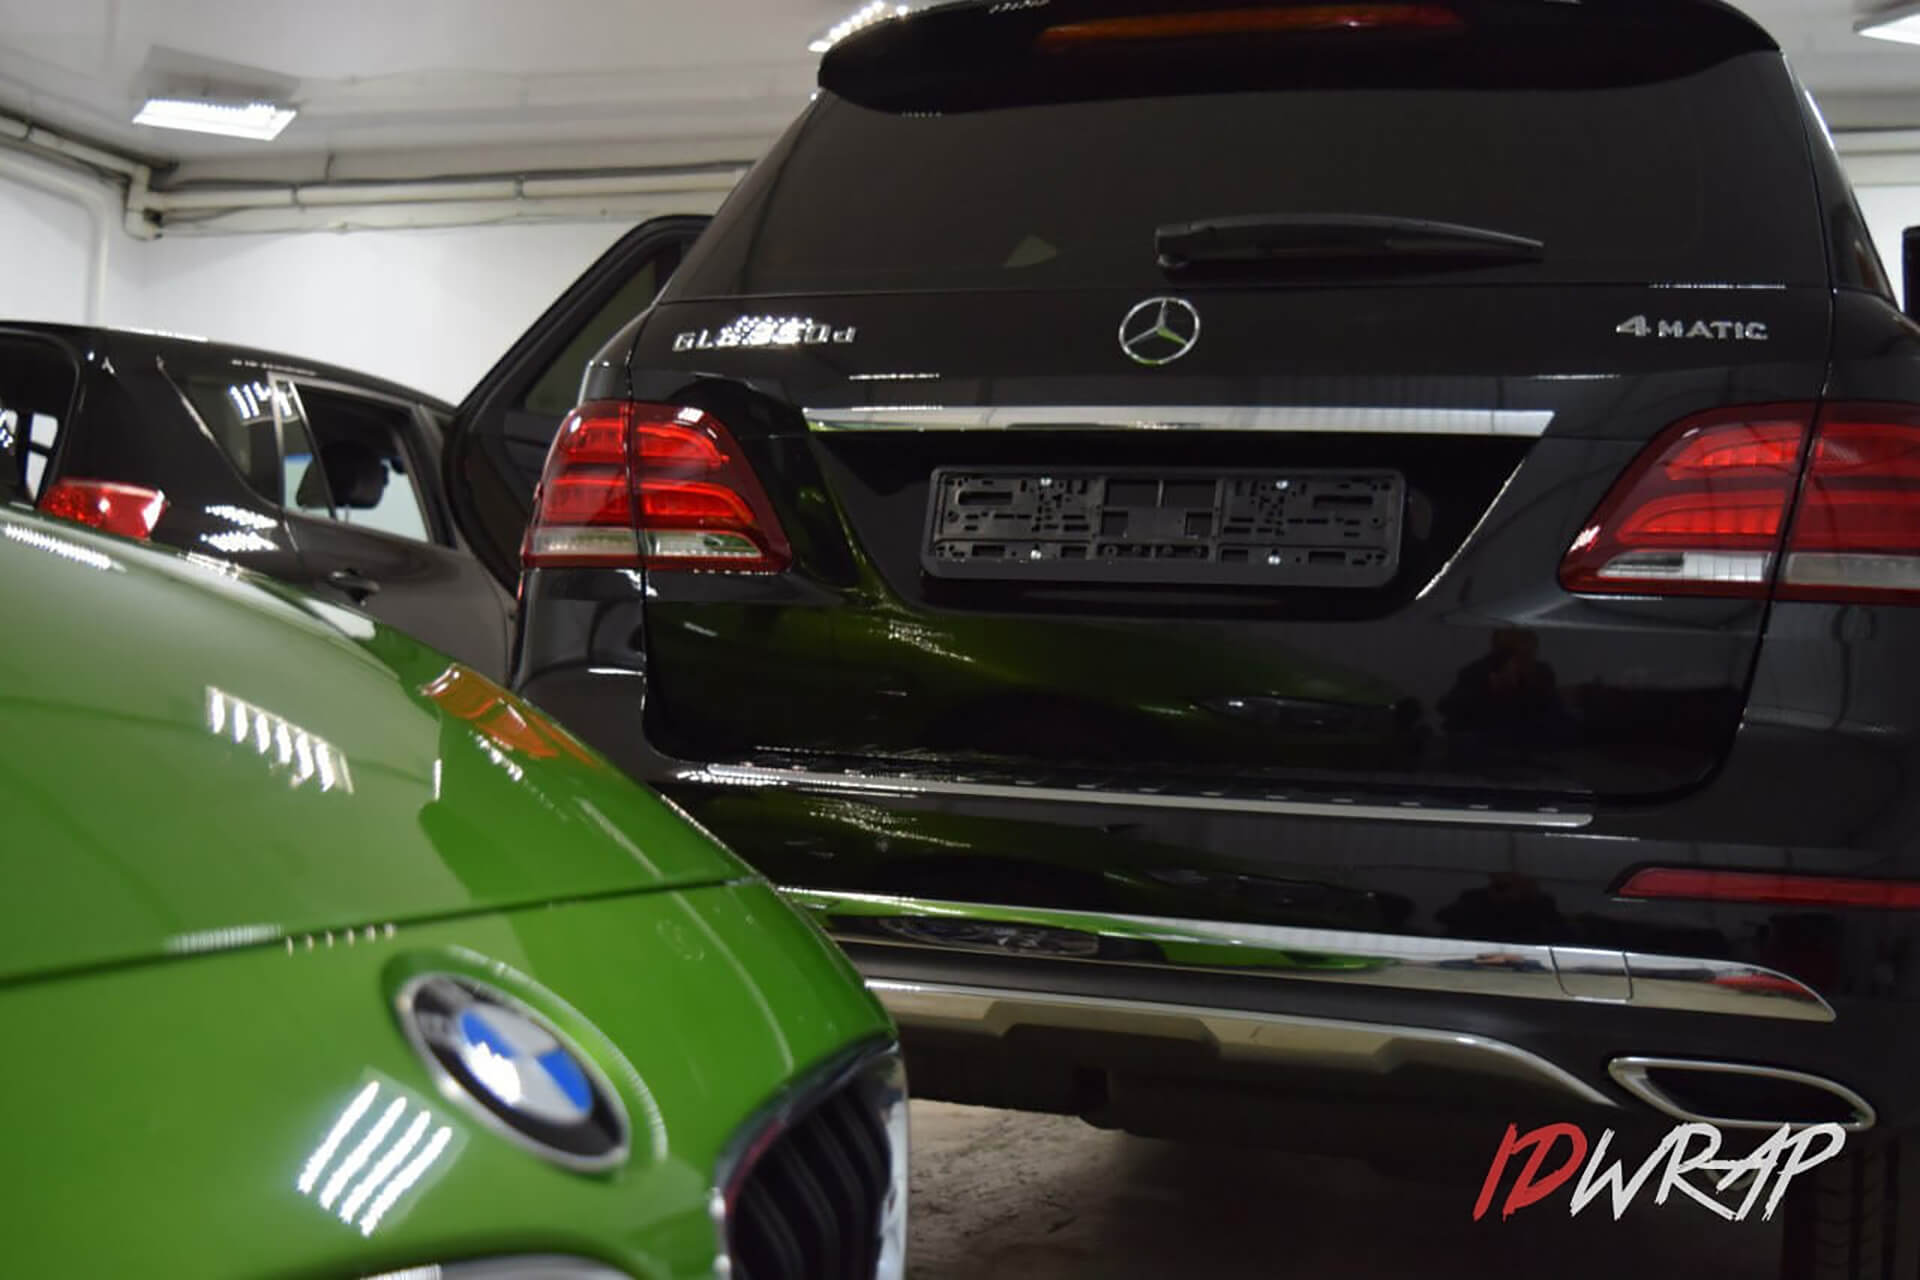 Mercedes-Benz GLE 350d антигравий